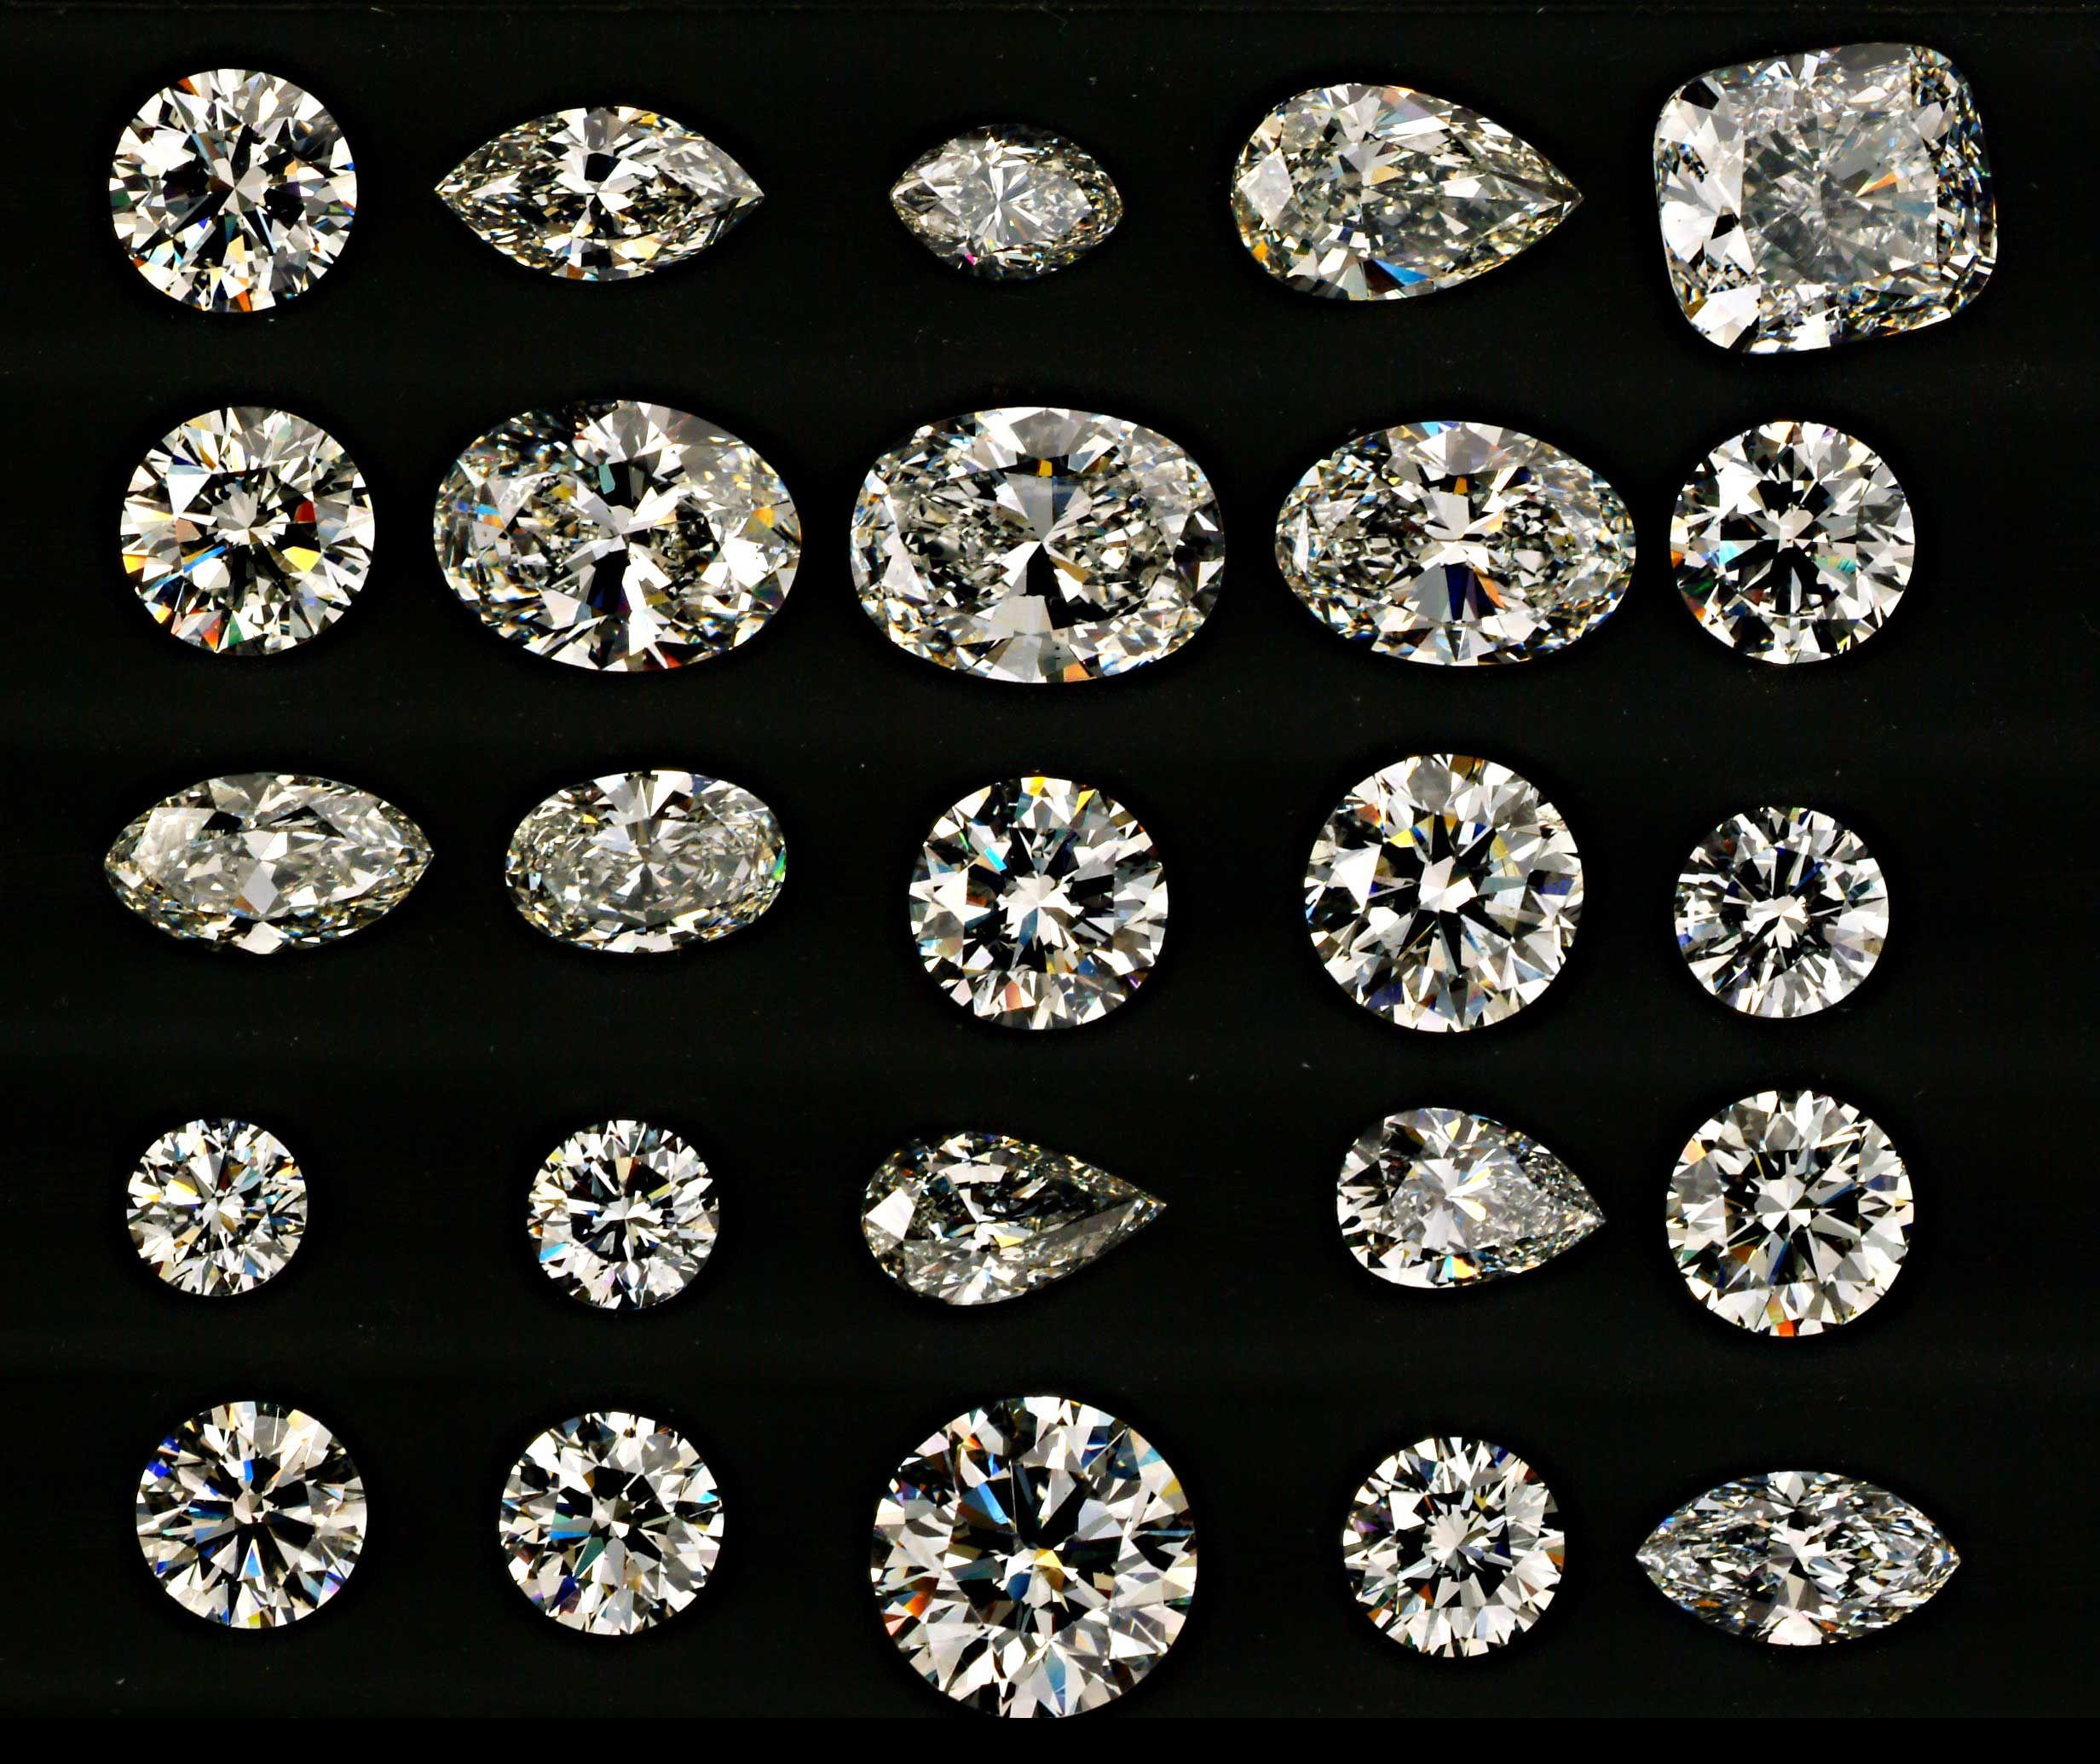 Over Grading Of Blue Fluorescent Diamonds Revisited